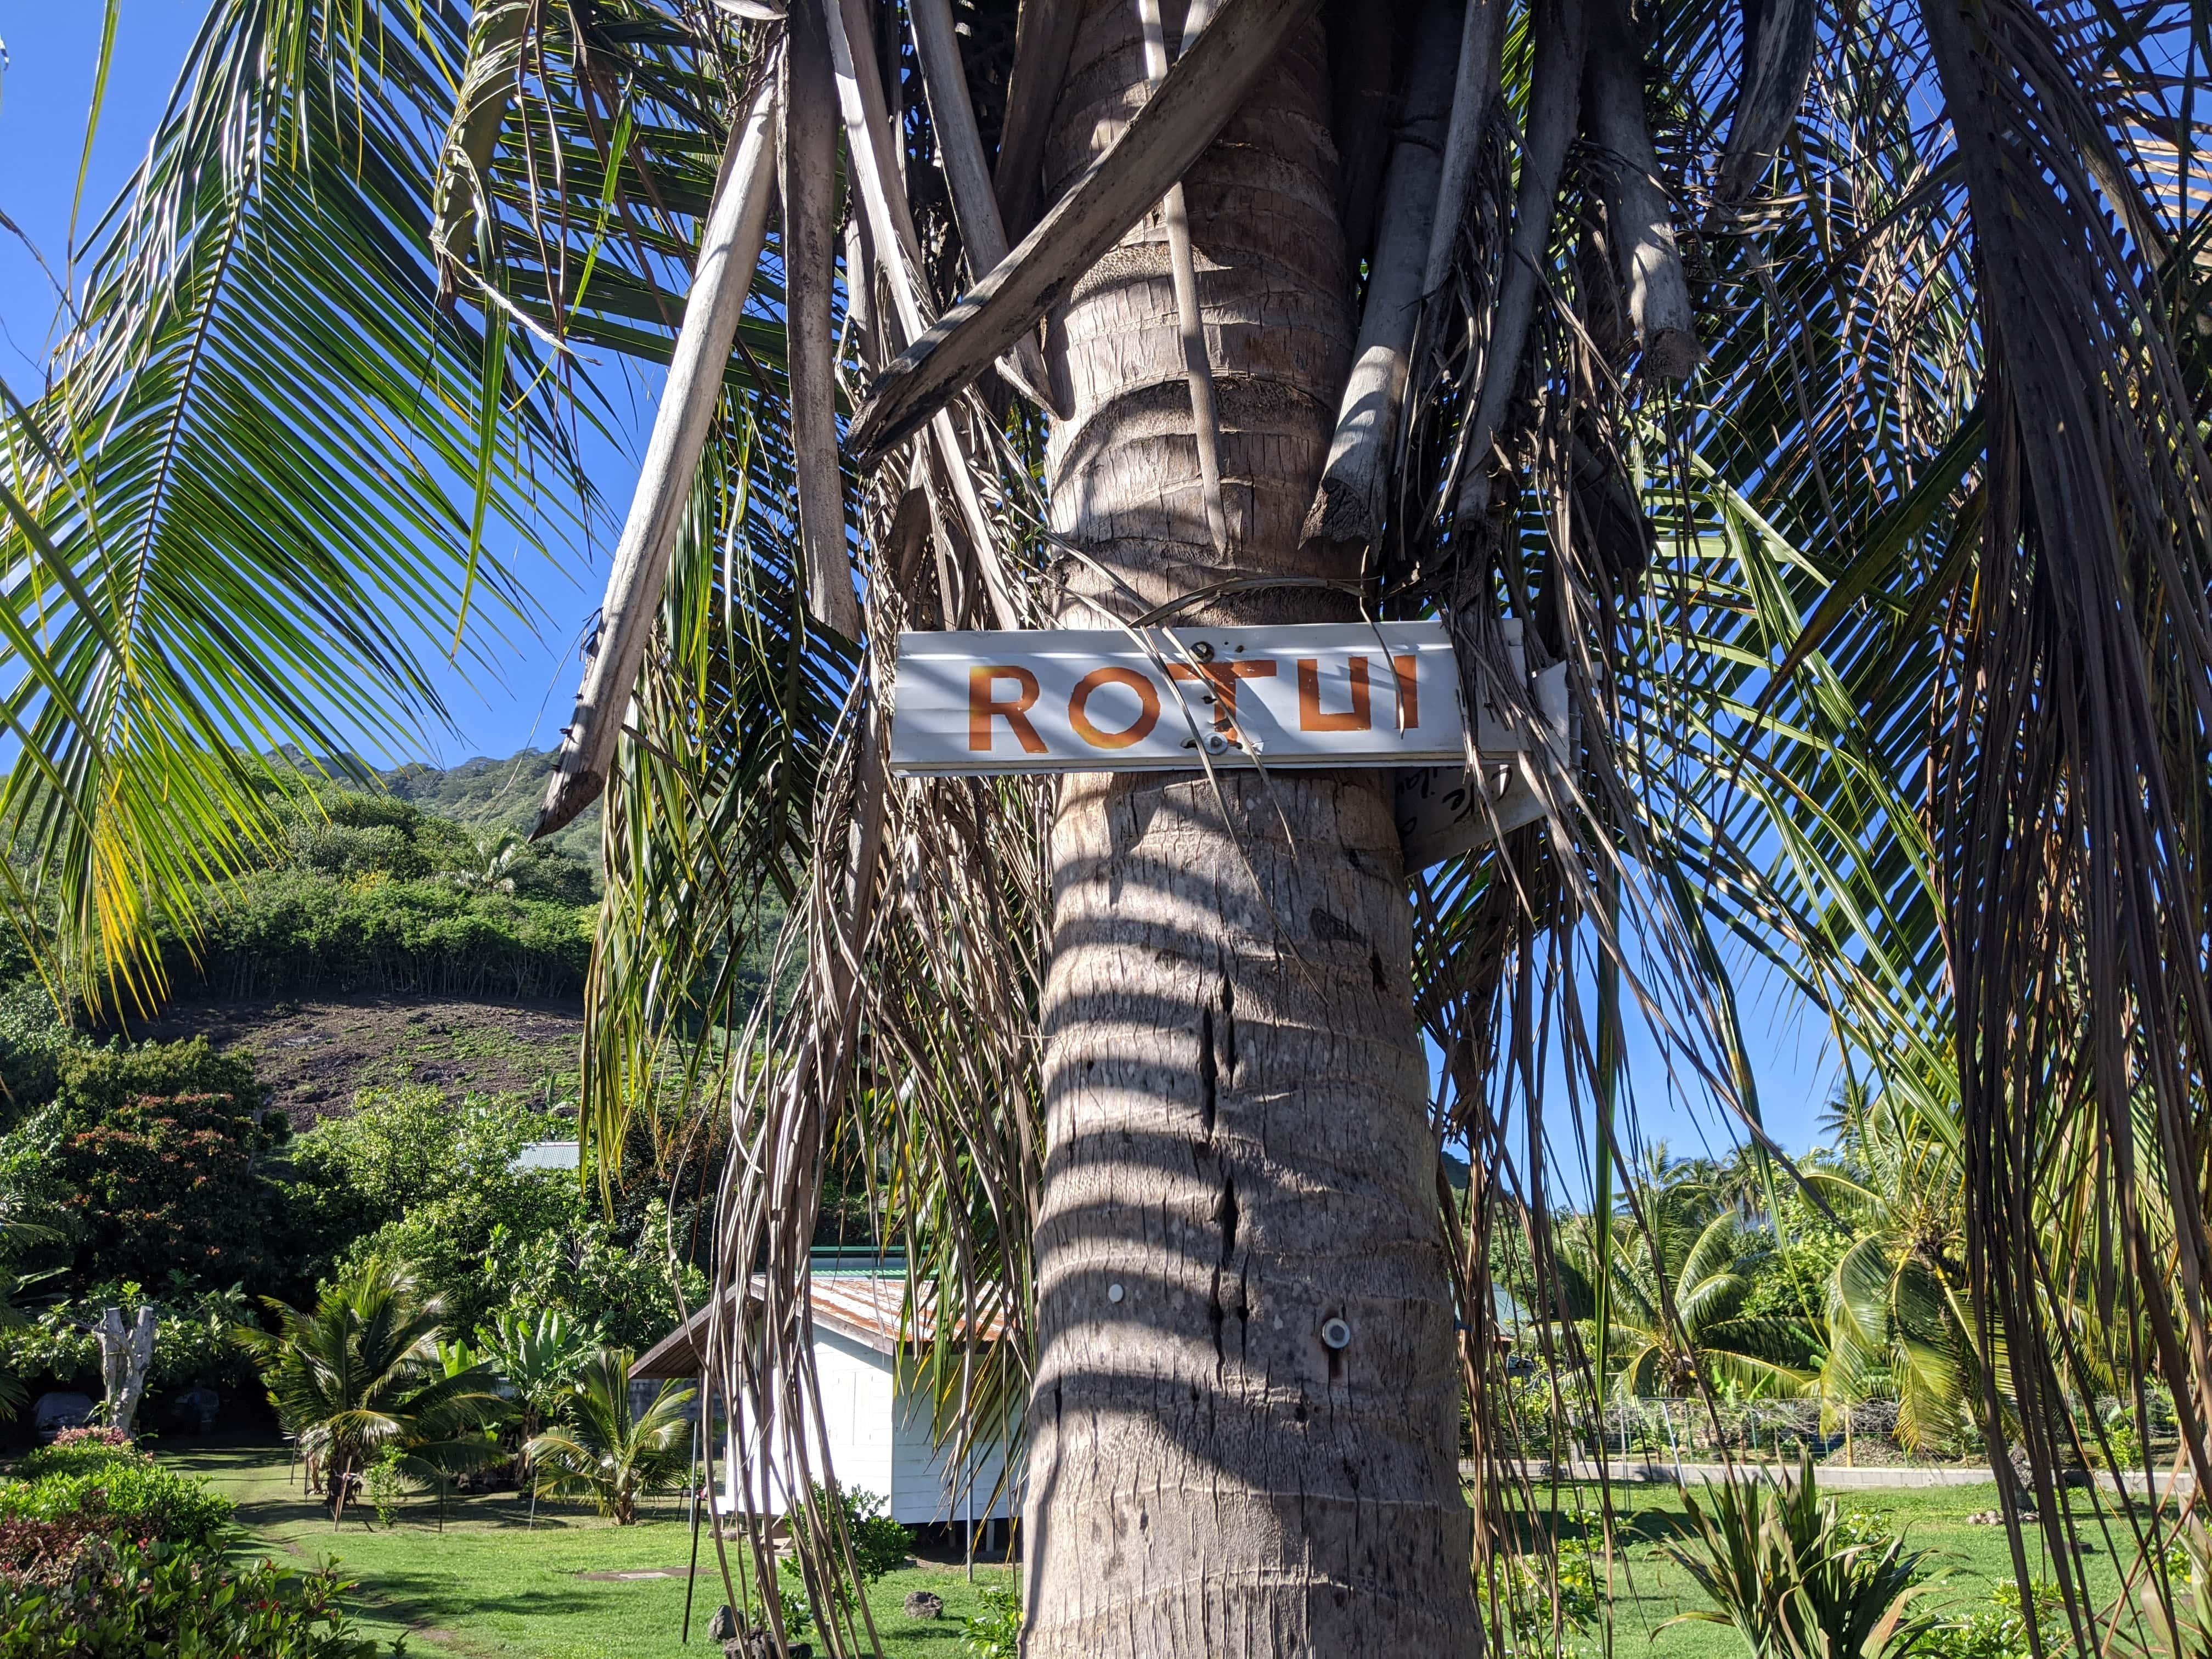 Entrance Sign To Mount Rotui Hike